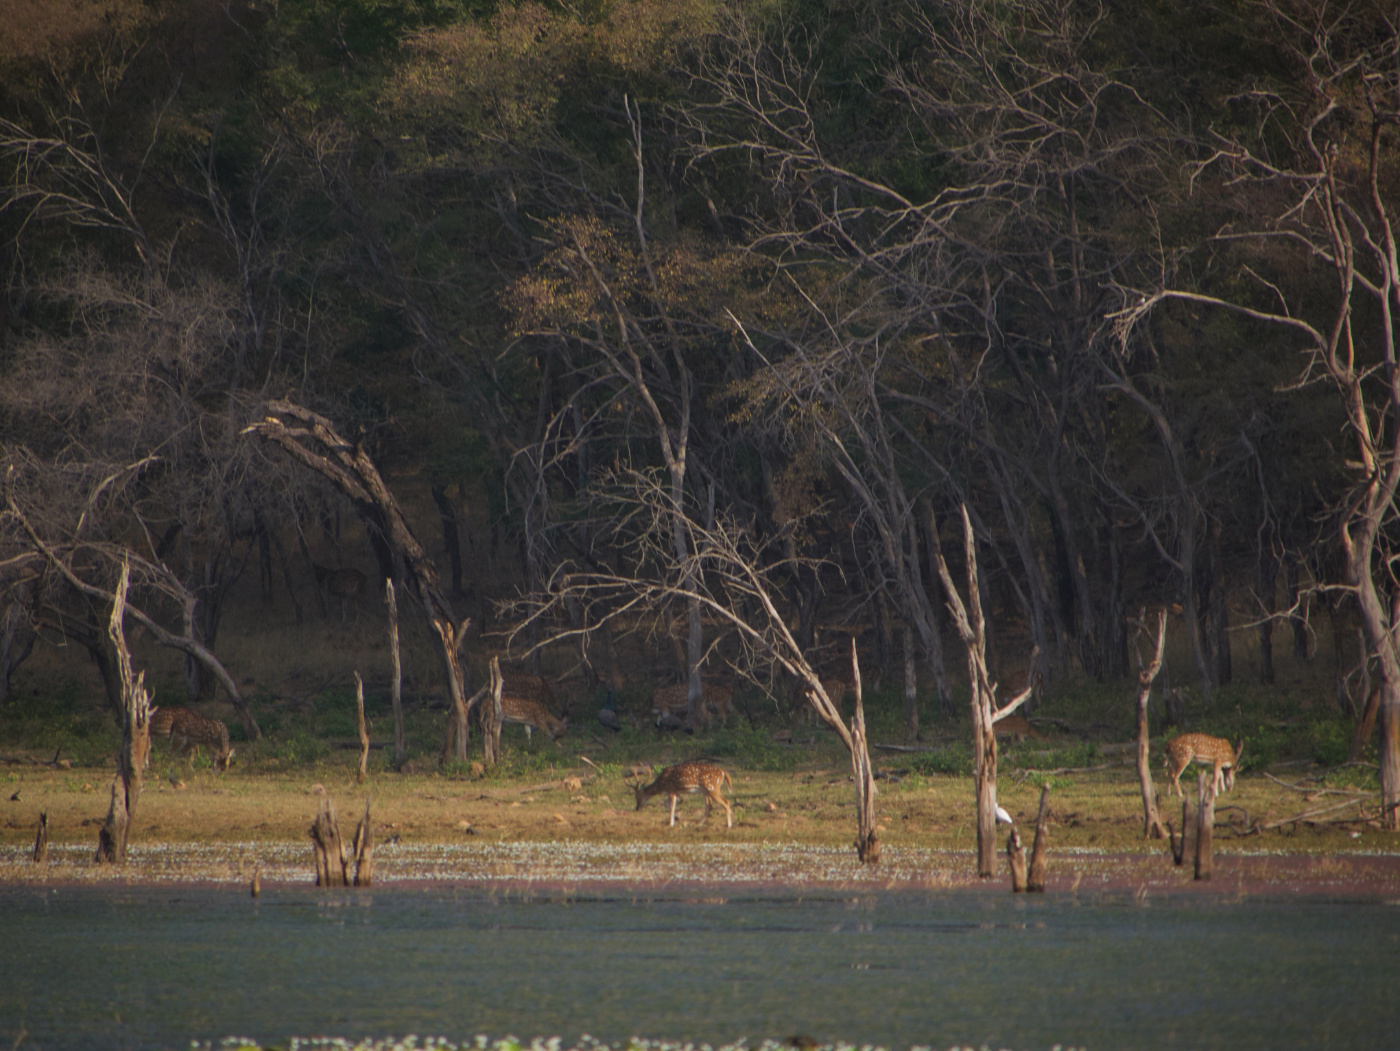 113-India-Ranthambore